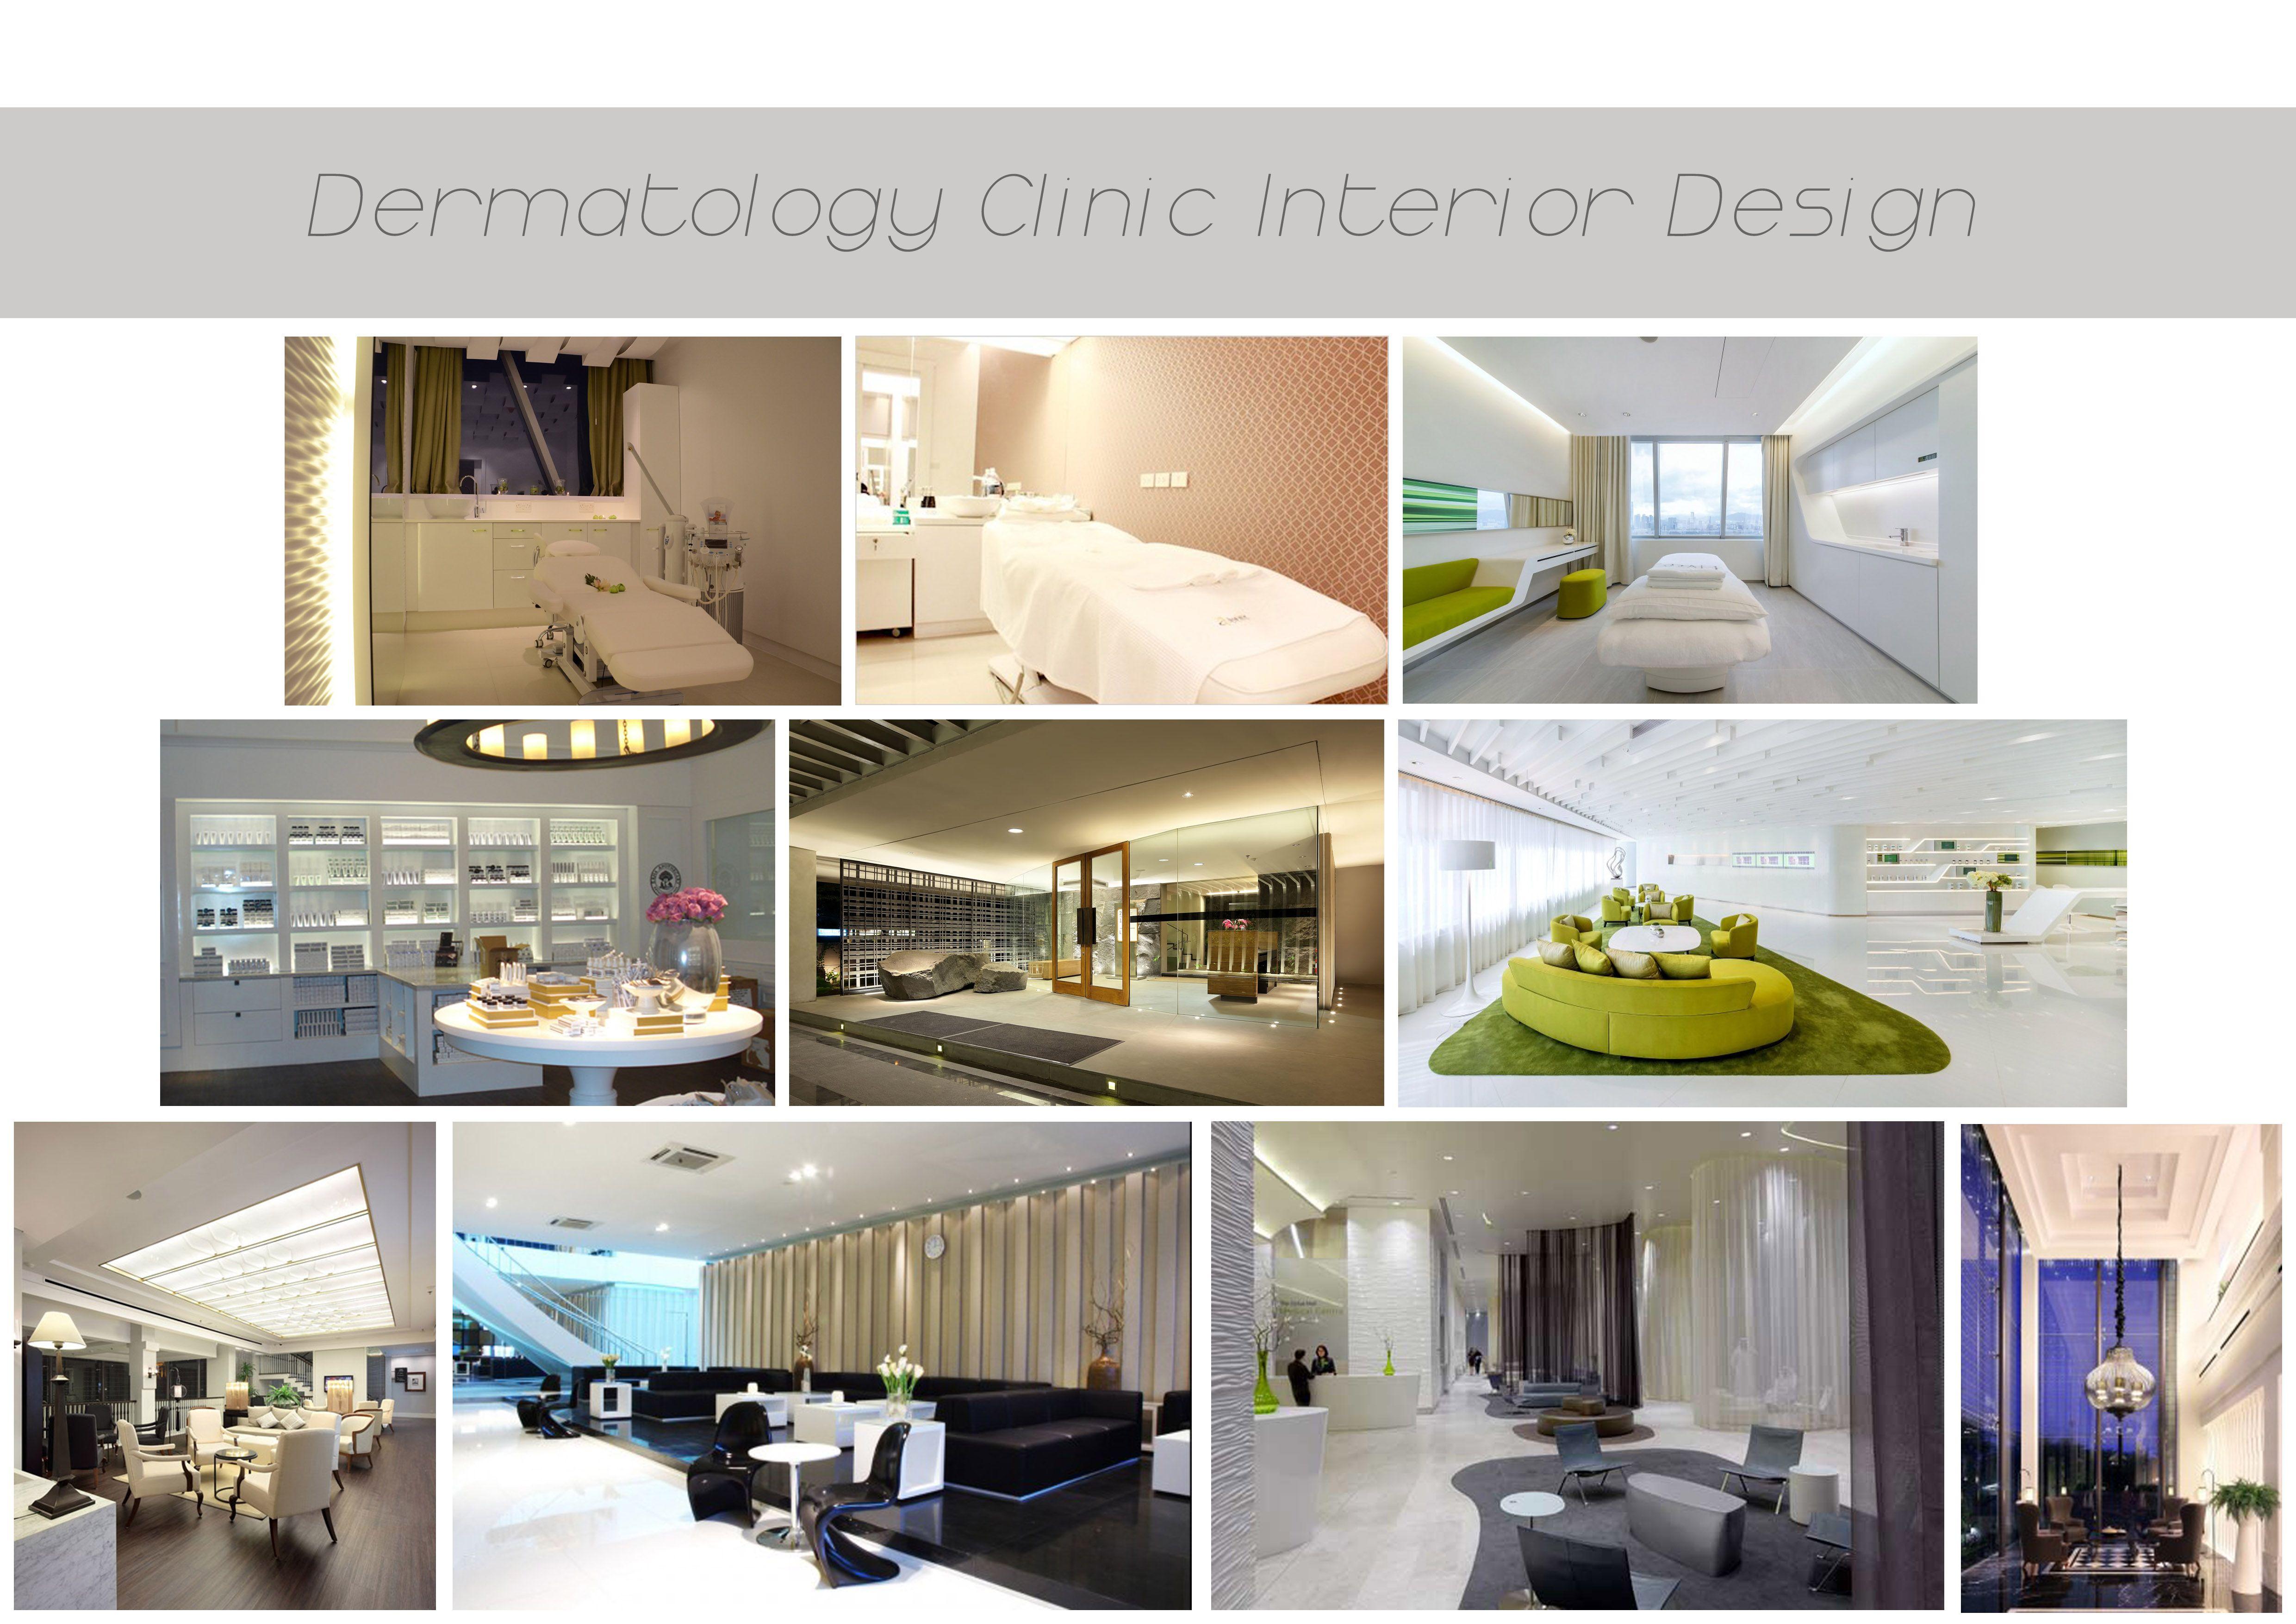 Dermatology Clinic Interior Design Ideas Ideas For The